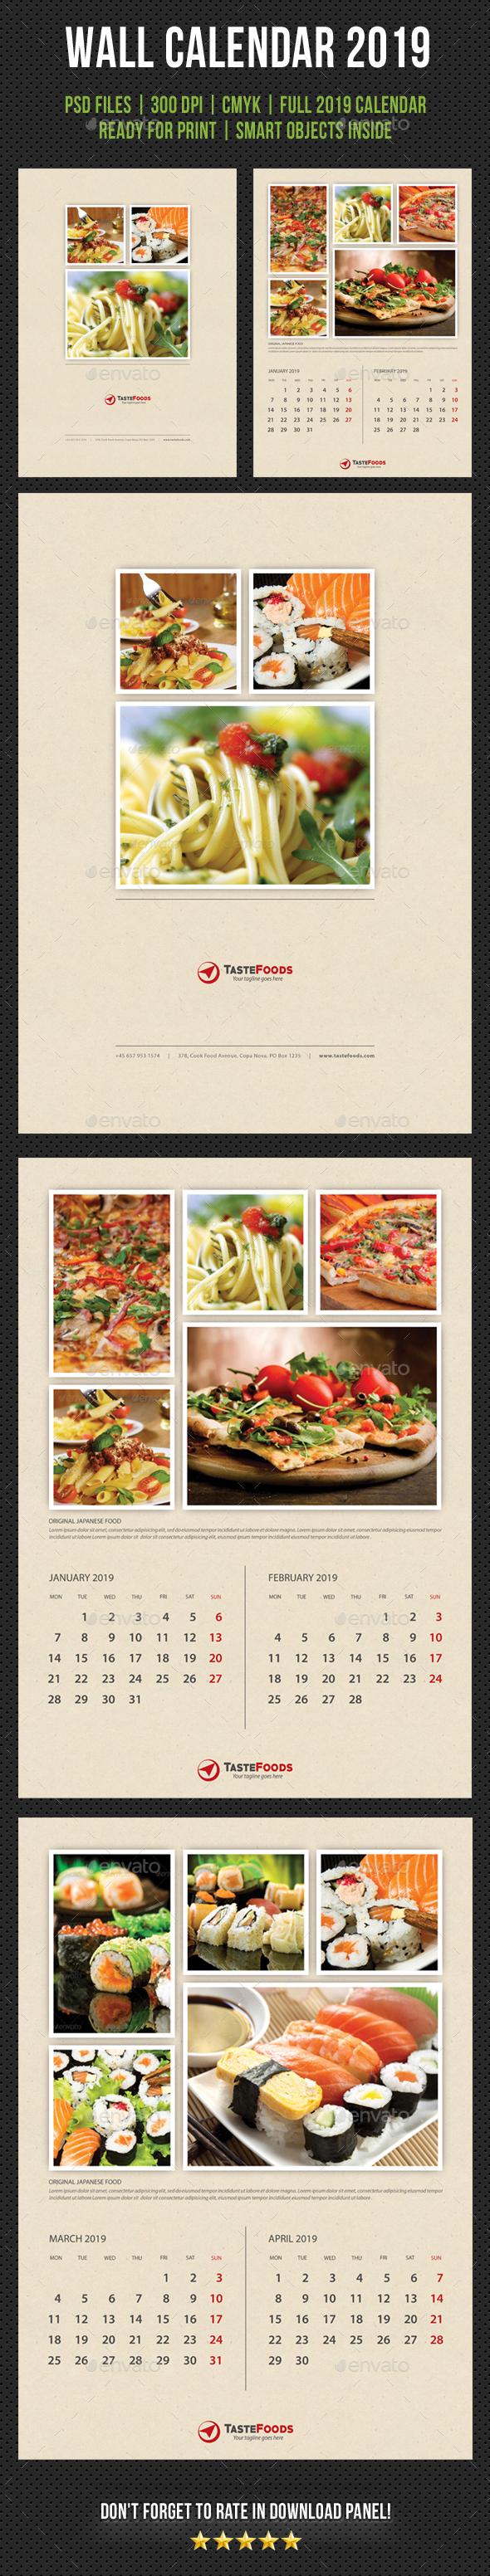 Cook And Food Wall Calendar 2019 V02 - Calendars Stationery